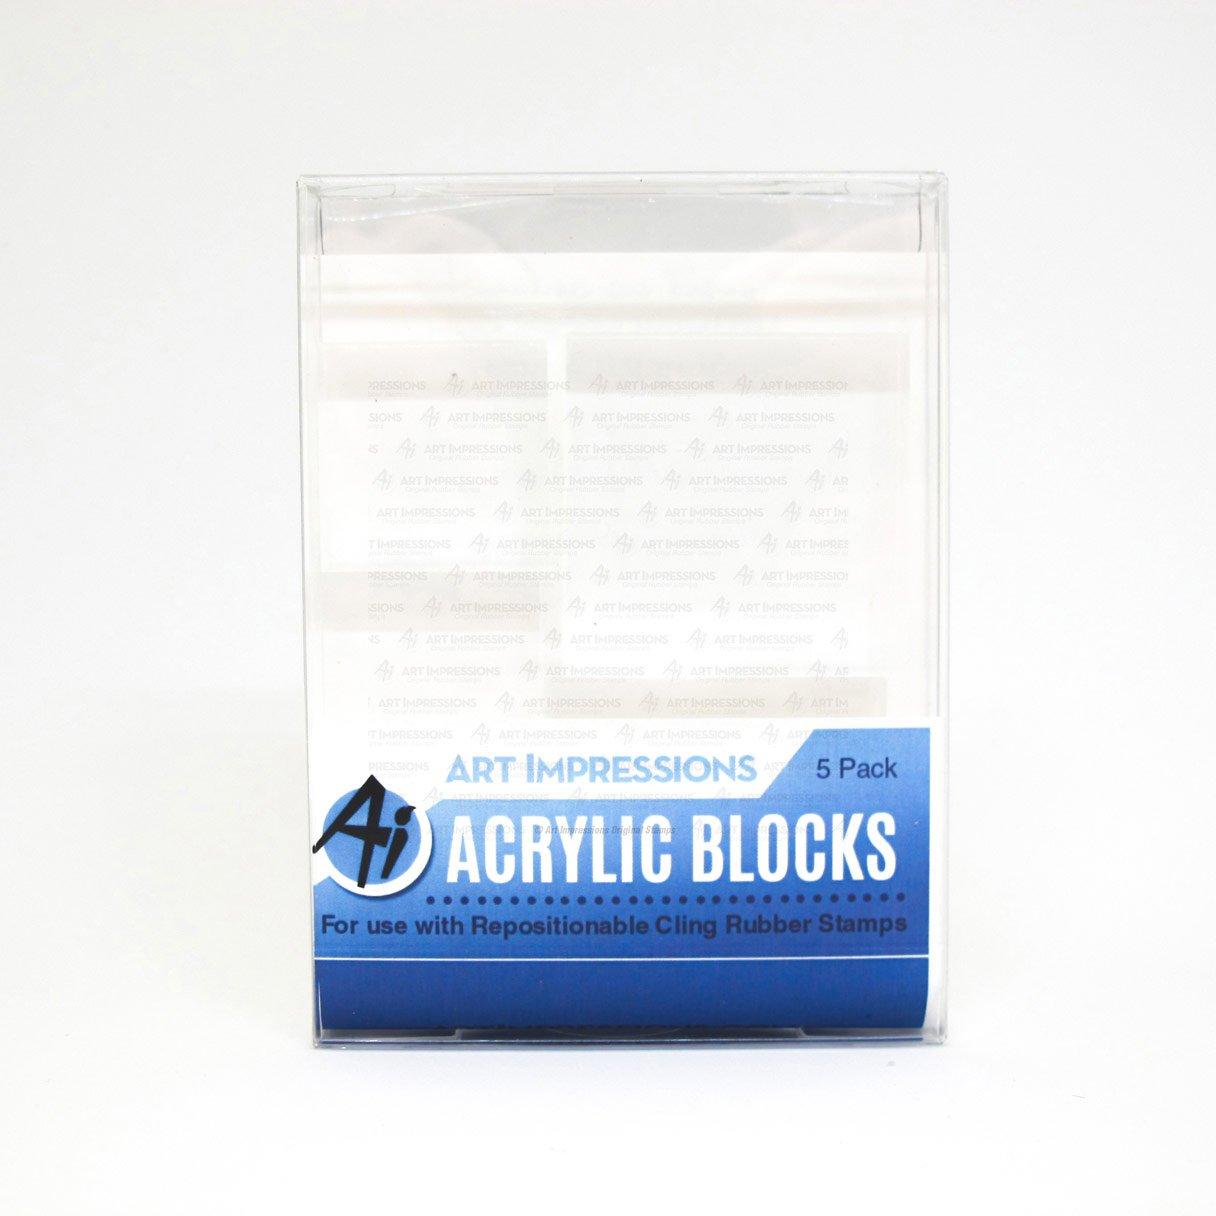 Art Impressions: Acrylic Block 5 Pack (Variety)